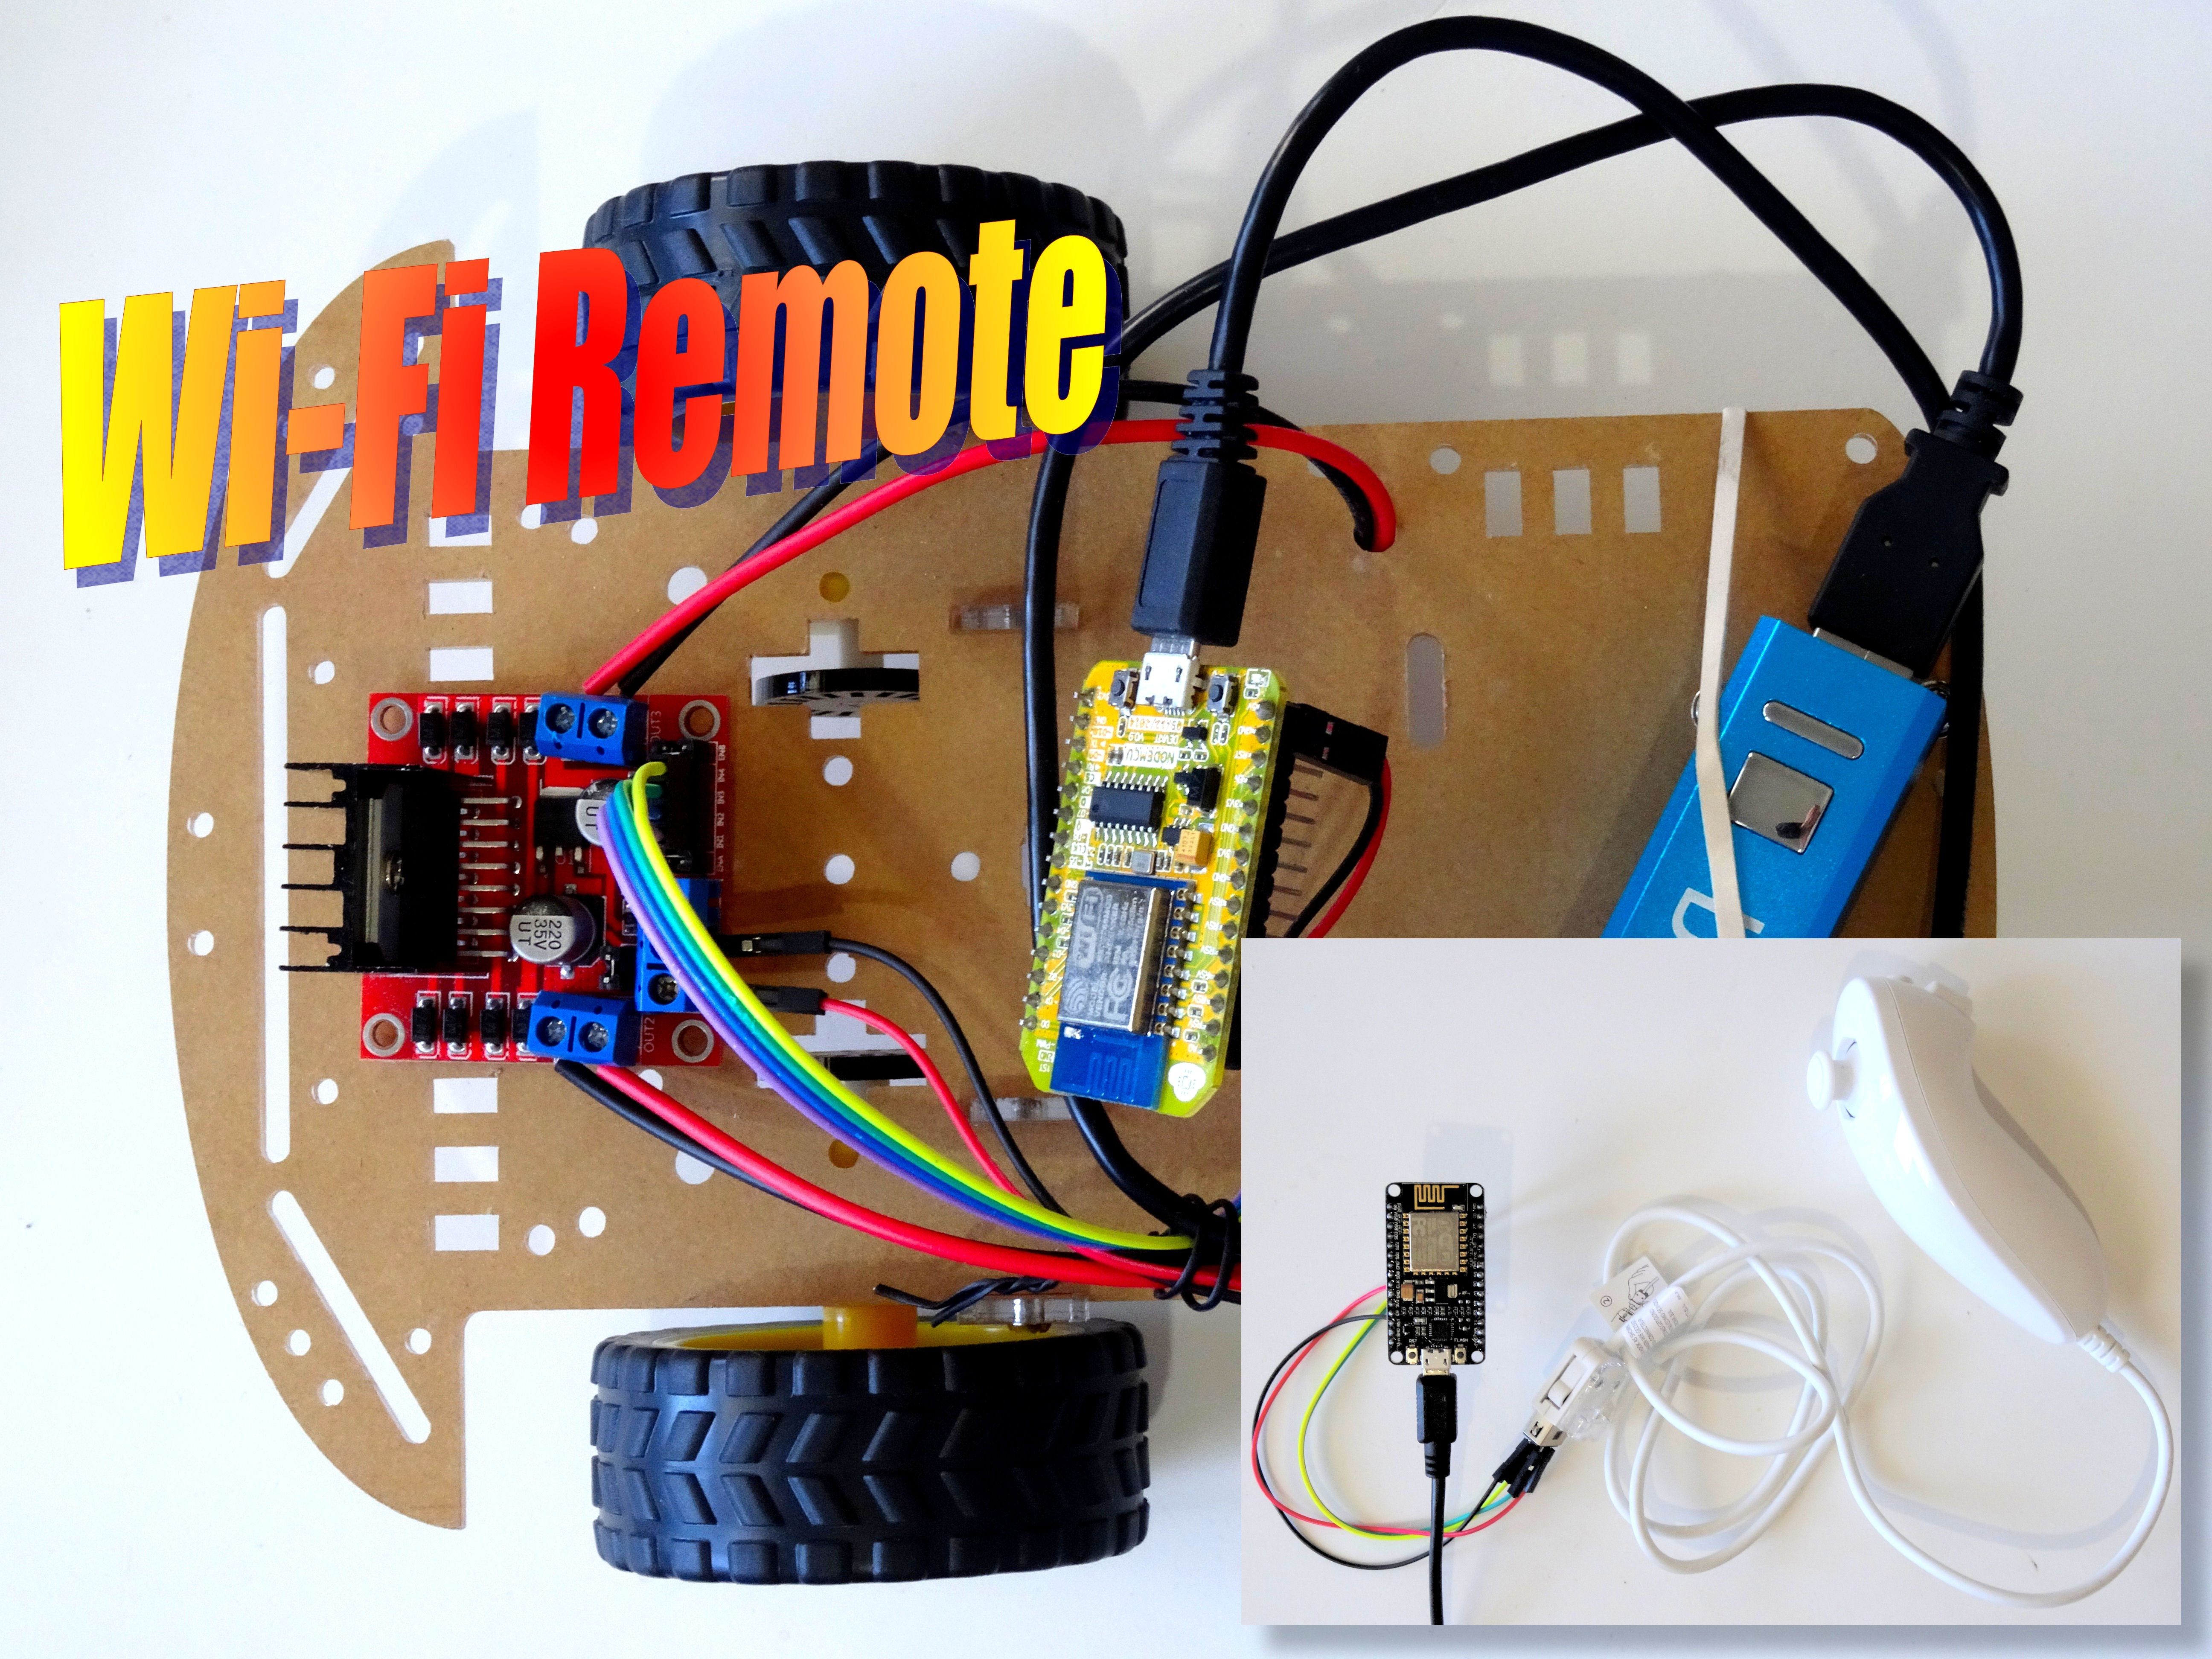 Wii Nunchuck Wire Diagram 25 Wiring Images Nunchuk Esp8266 And Wifi Remote Control Car Robot Hackster Io Dsc03403normalizededitednewautocompress2cformatw900h675fit